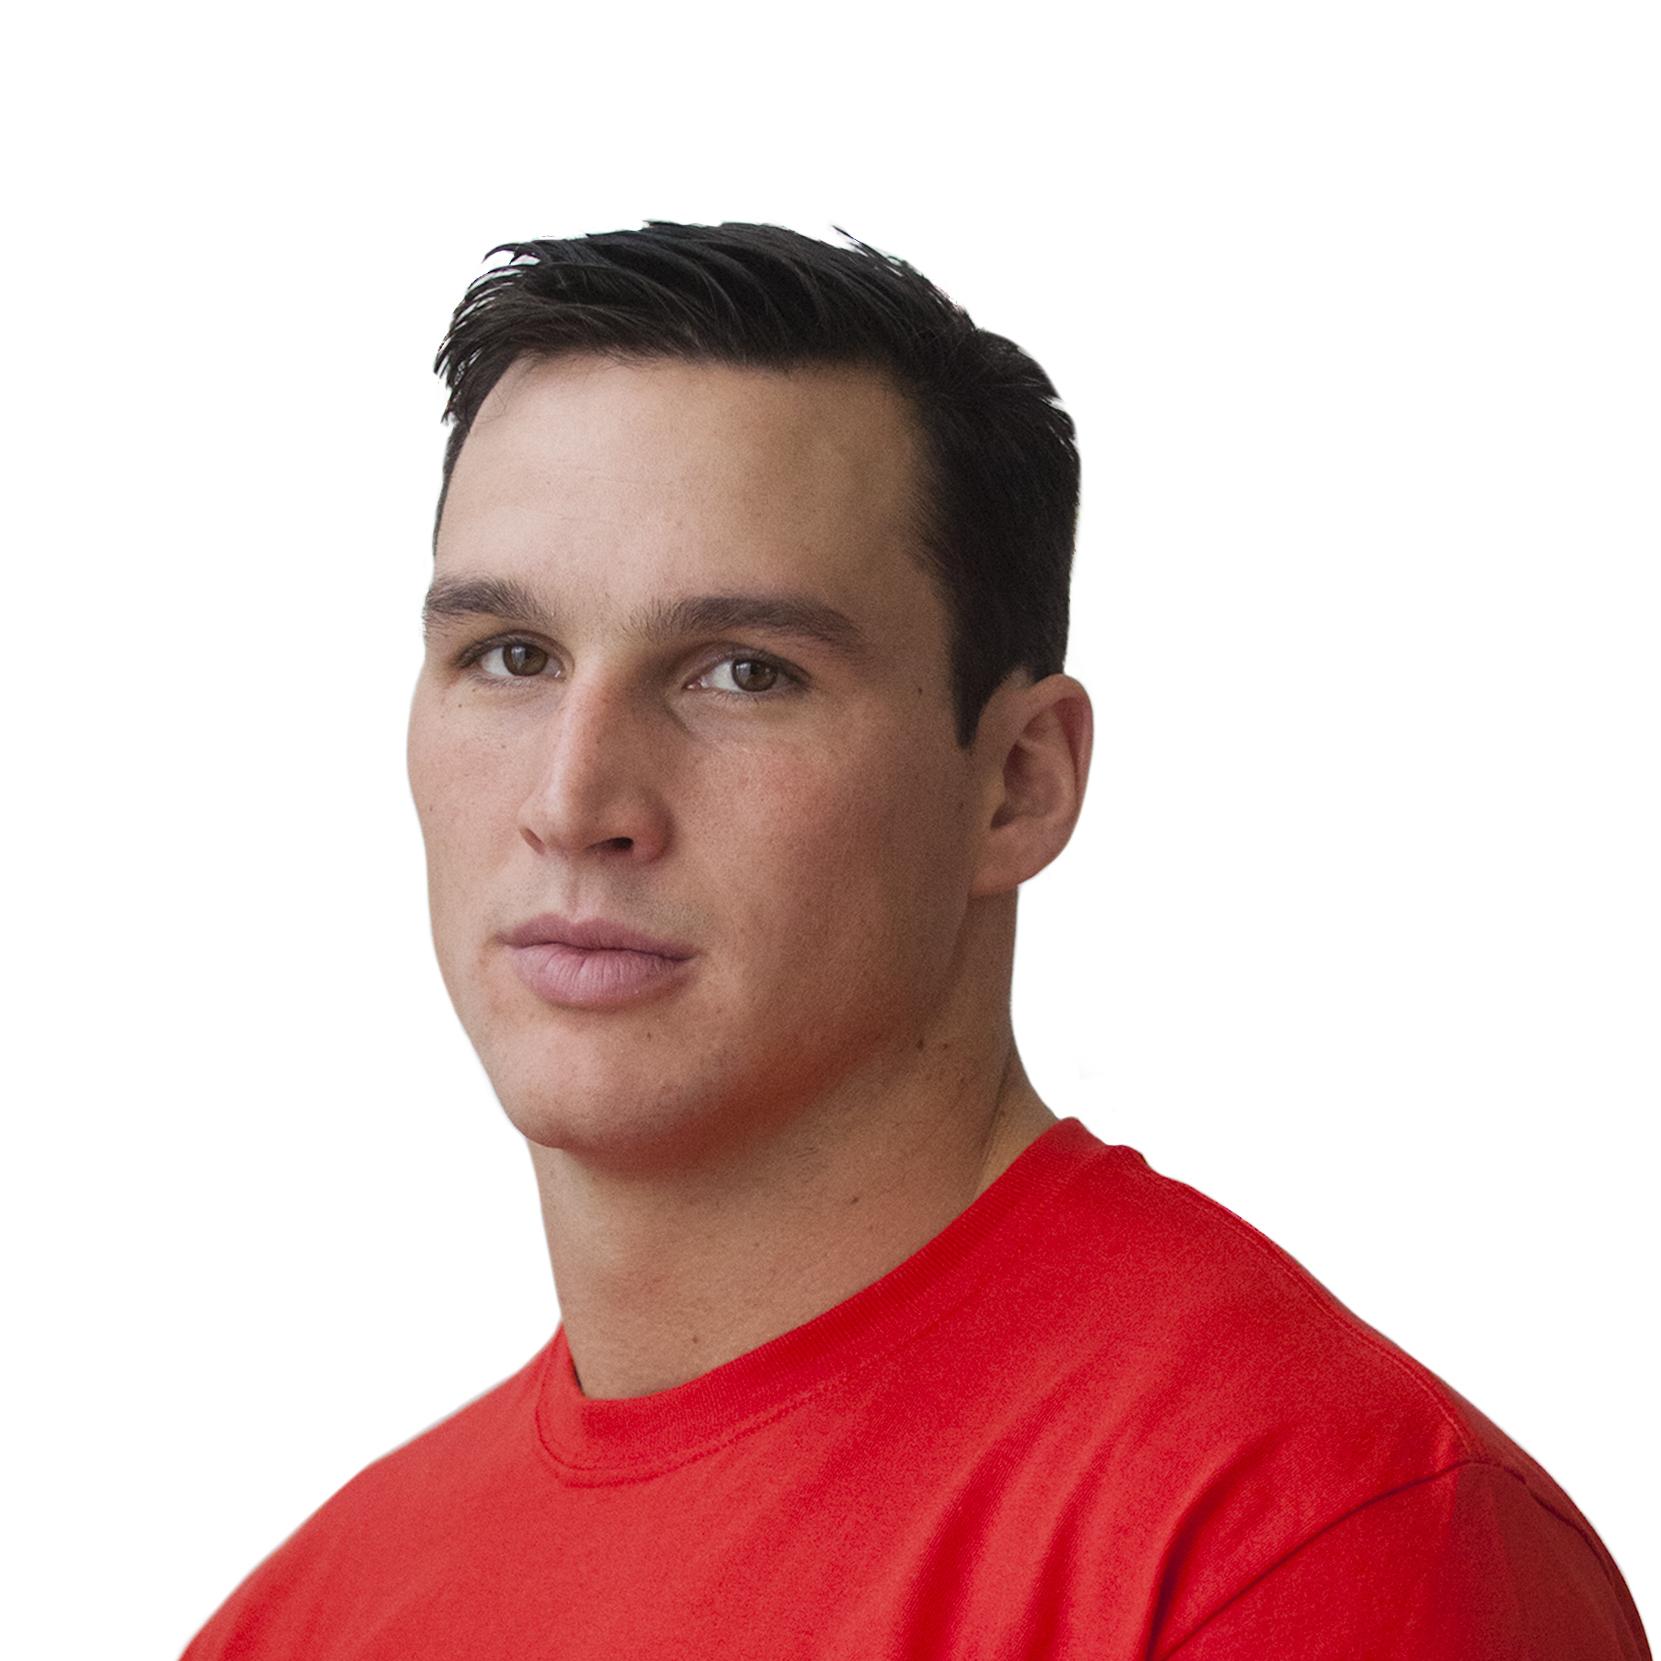 Simon Kean